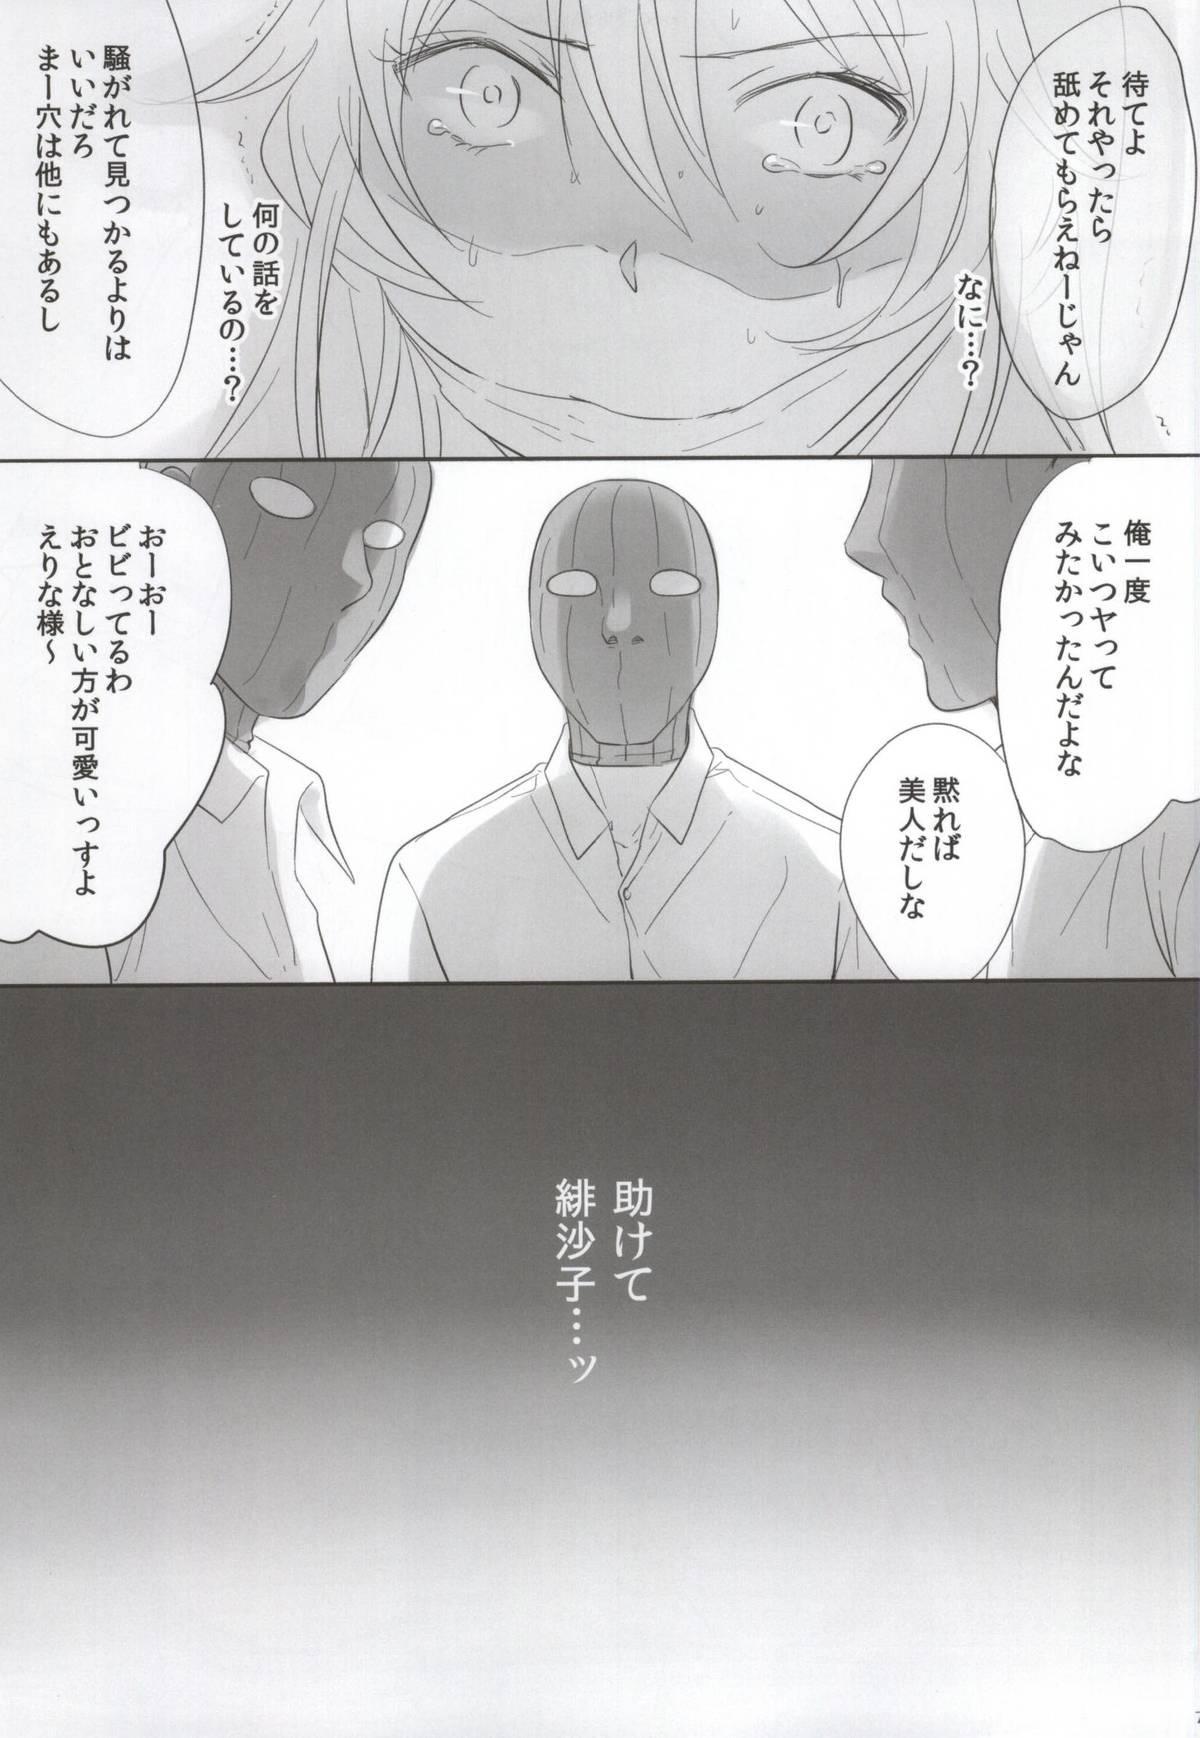 Erina-sama Tsukamaeta 5